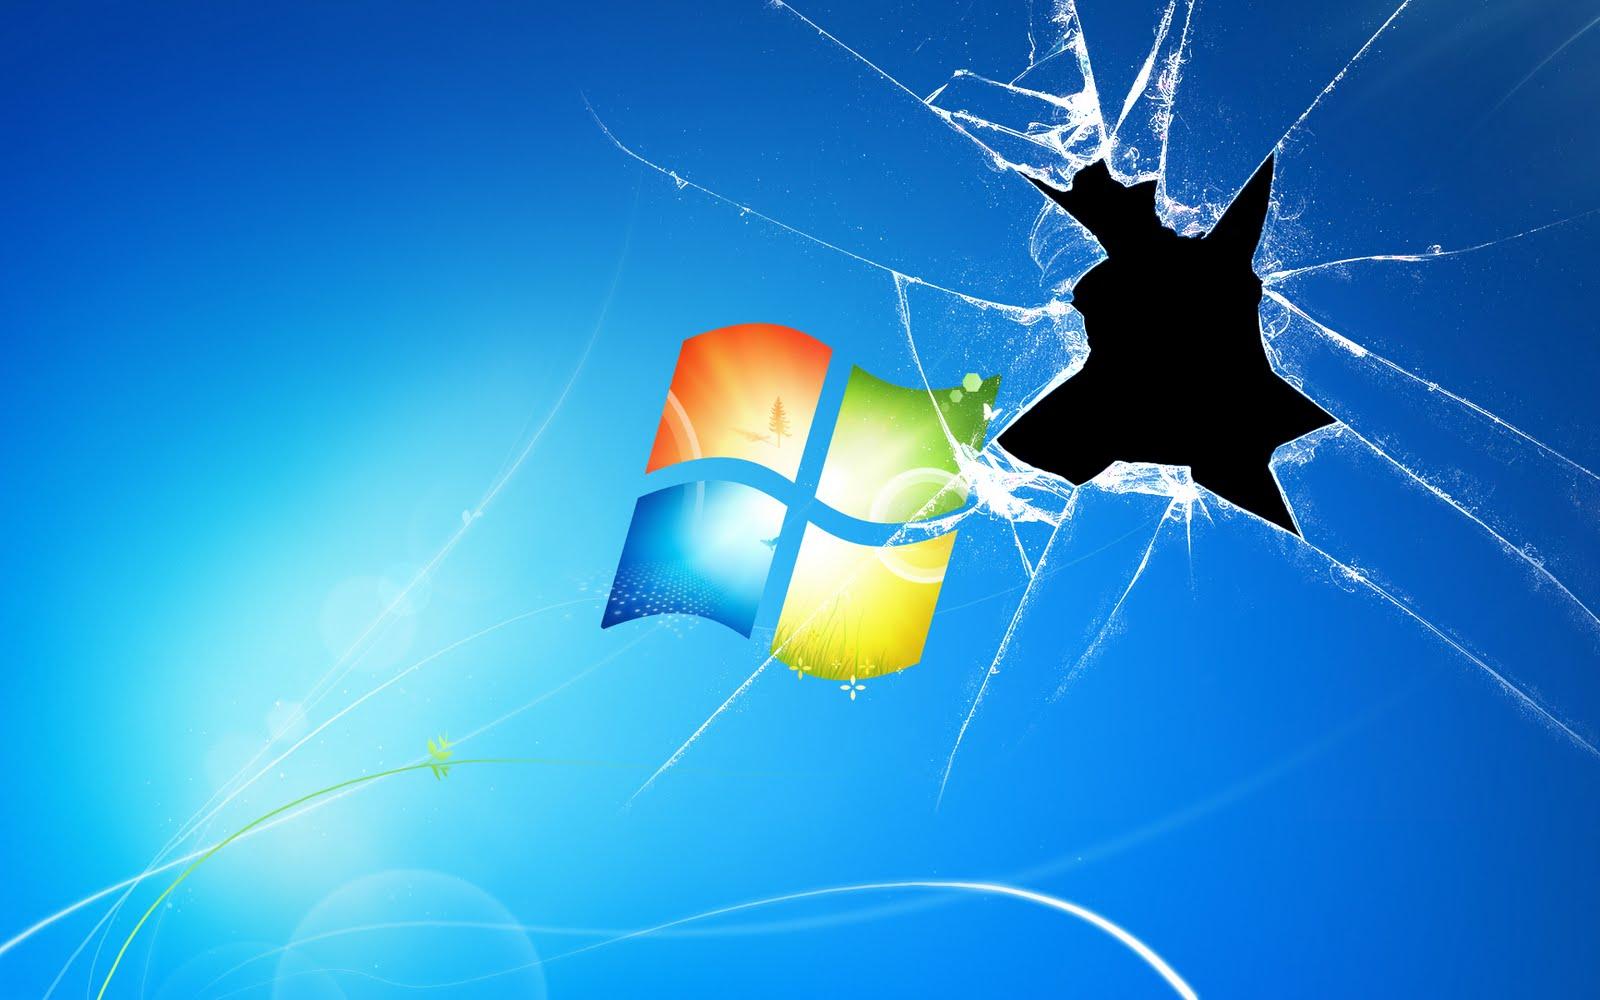 free animation hd wallpaper windows 7